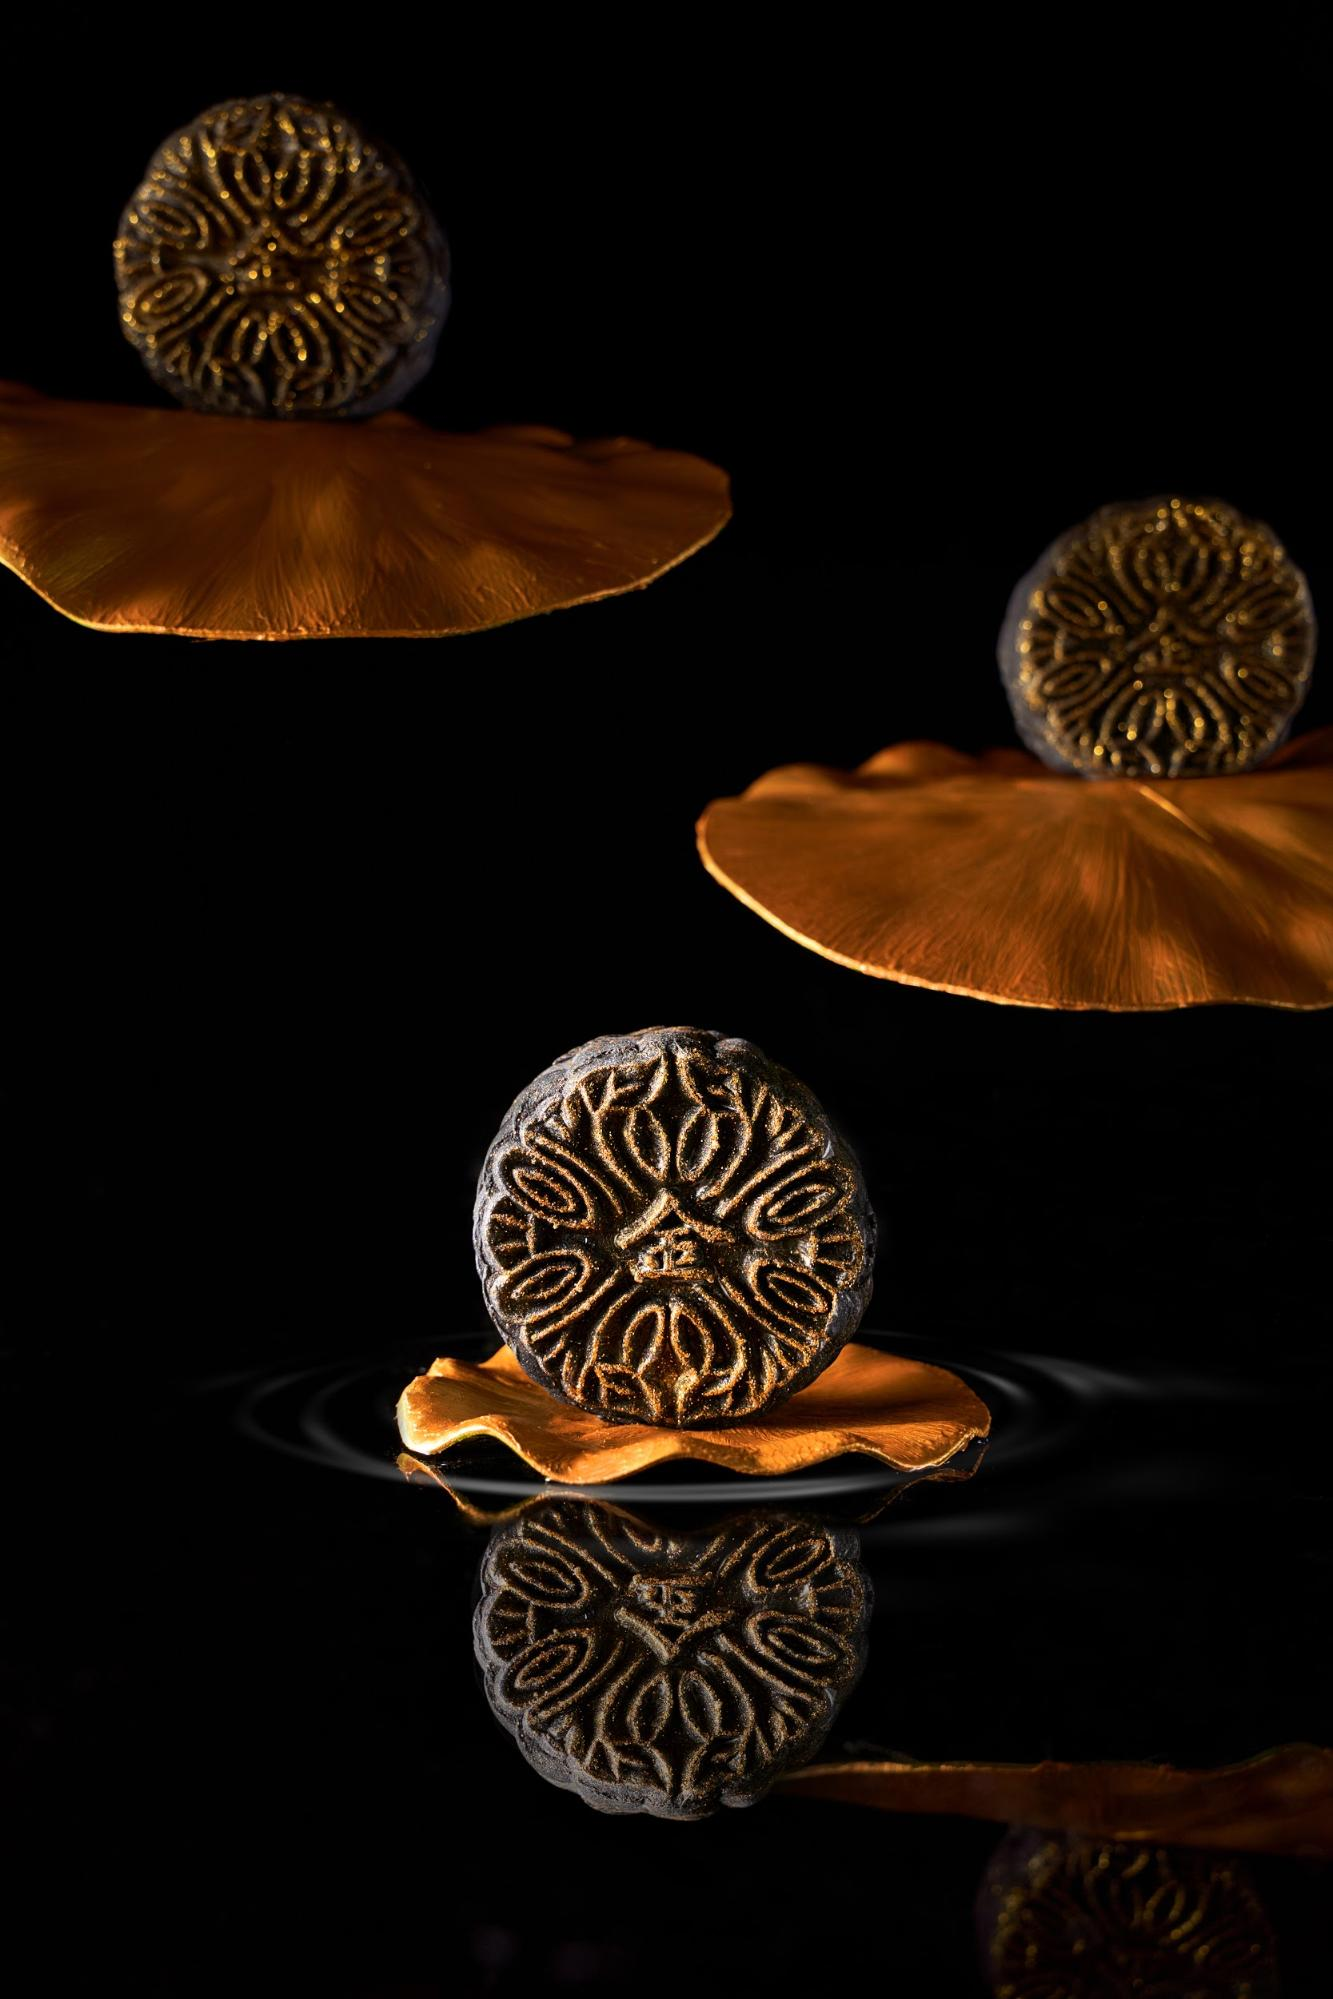 golden moments hazelnut mooncake